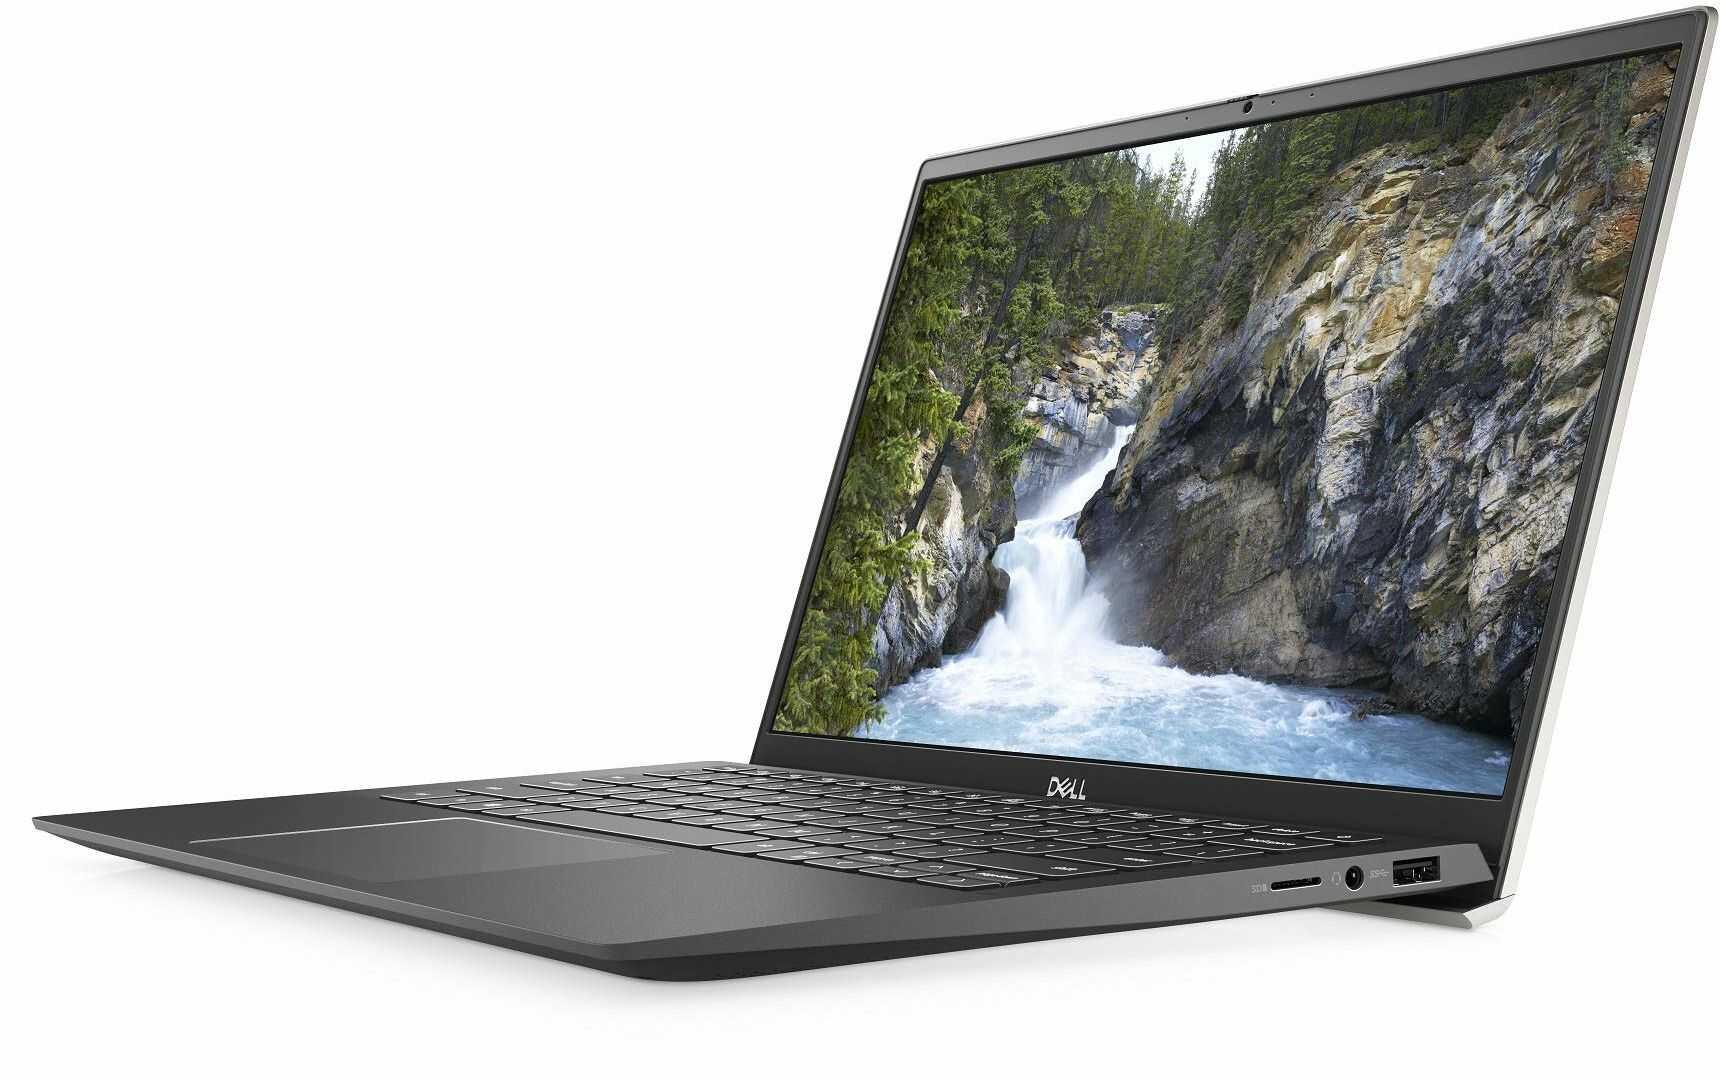 "DELL Vostro 5301 13.3"" FHD Biznesowy Laptop (Intel Core i5-1135G7, 8GB RAM, 256GB SSD, Windows 10 Pro) QWERTY"